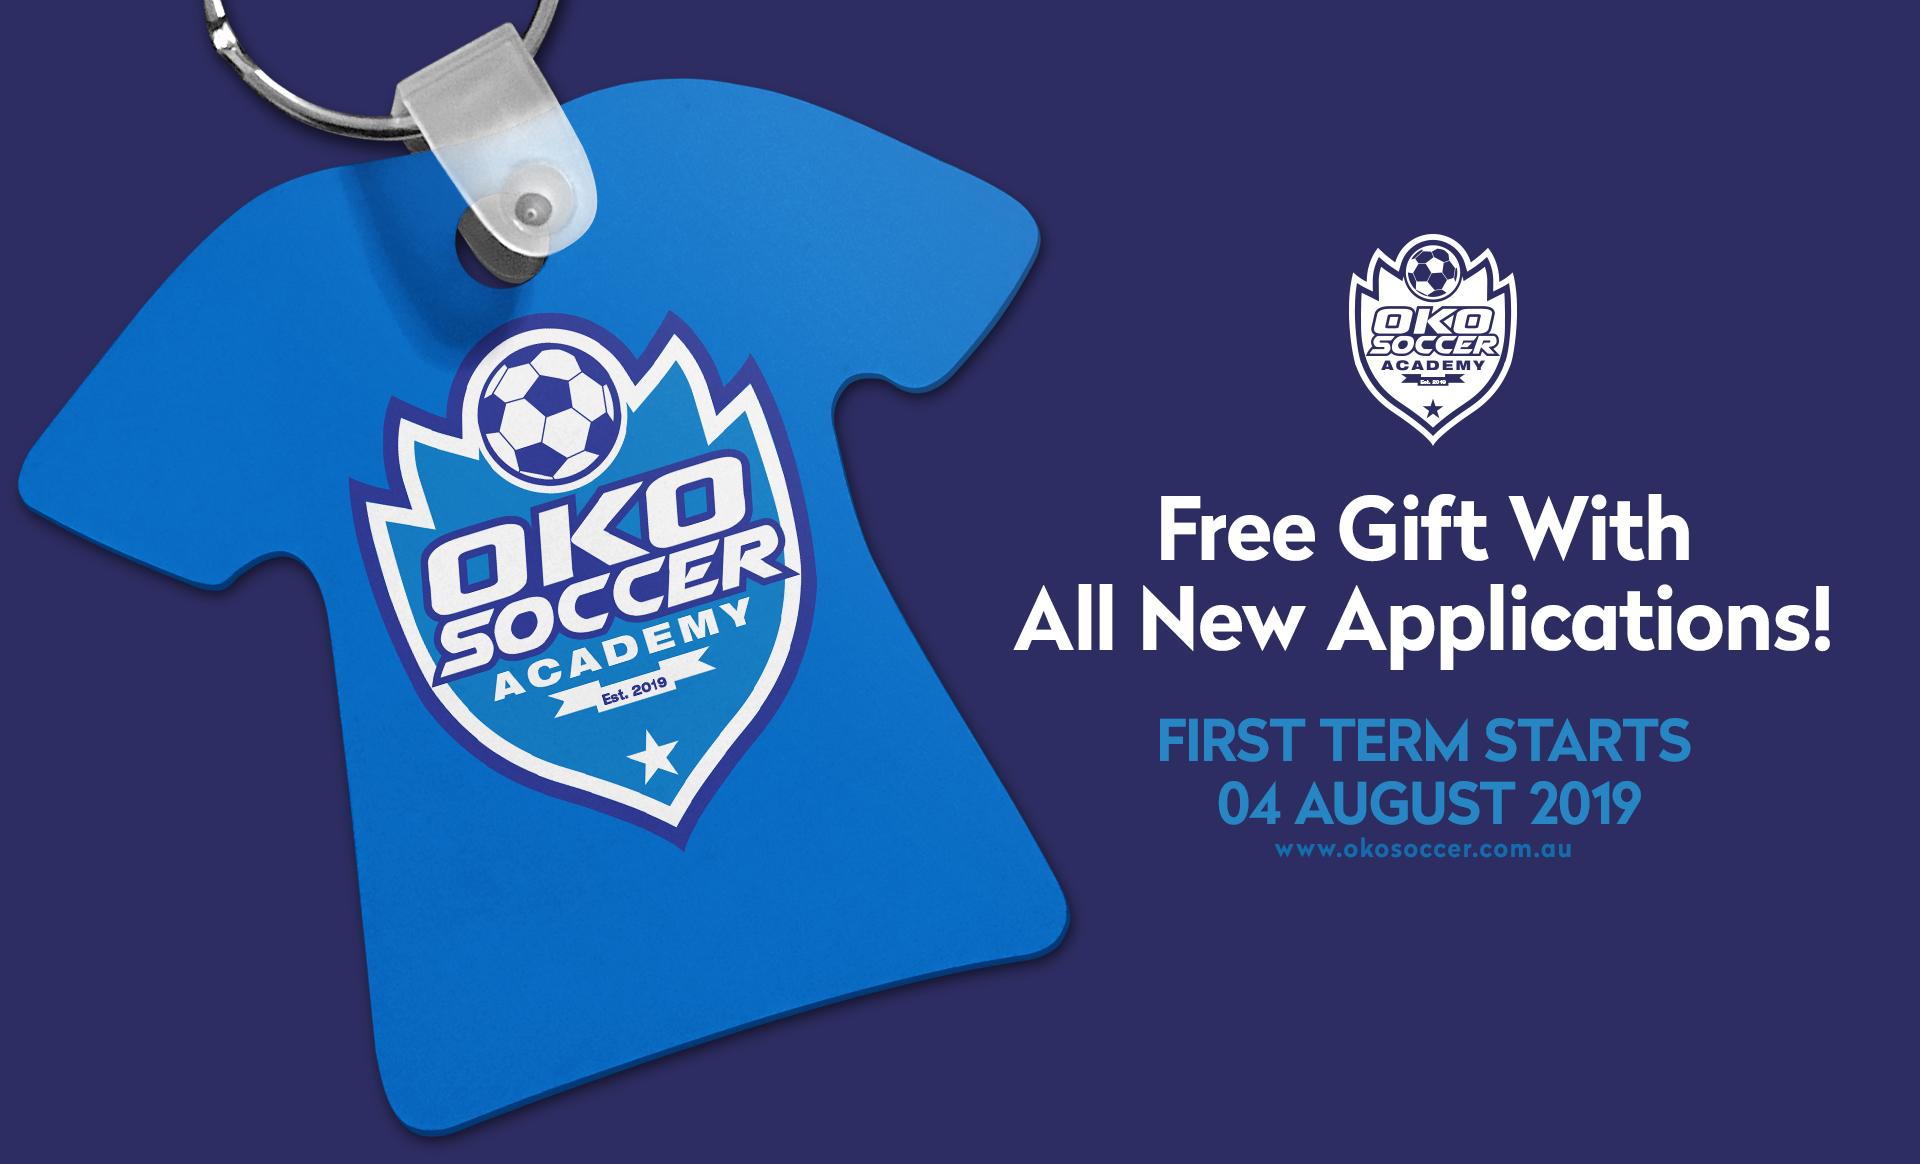 Branding, logo design, social media, marketing materials & web design for OKO Soccer Academy - premier coaching and traiing for kids.